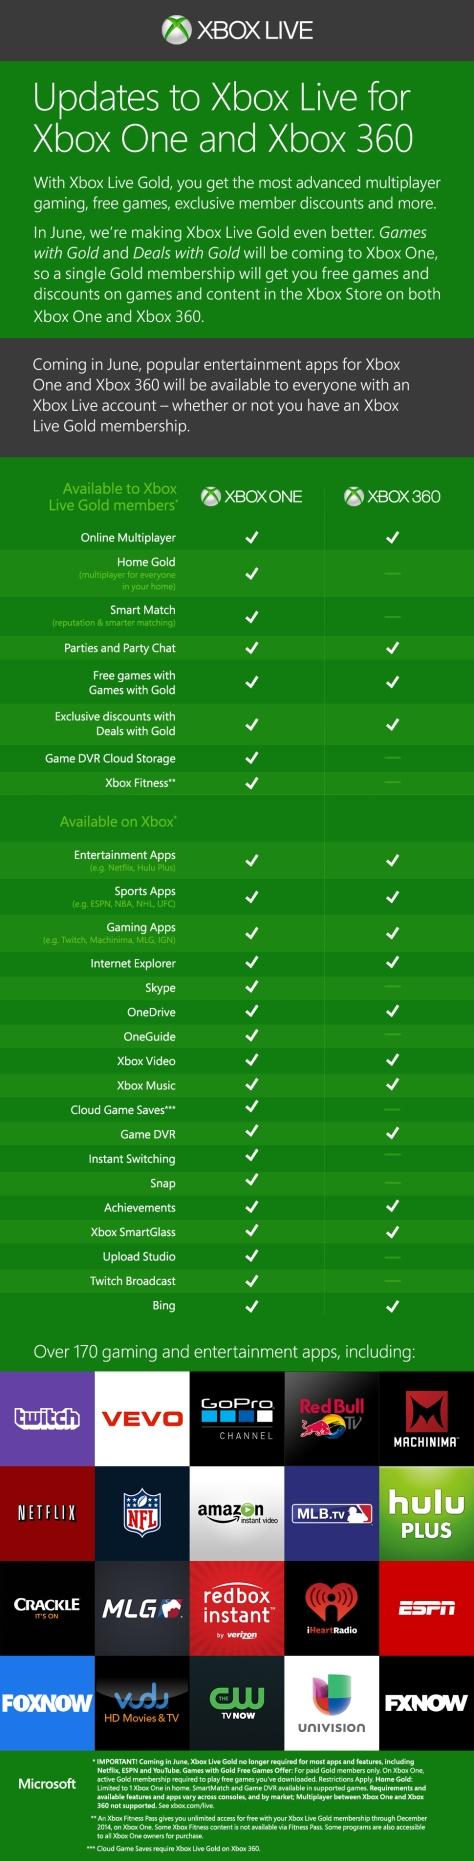 179794-08 Xbox Live Digital Poster-s14_FINAL